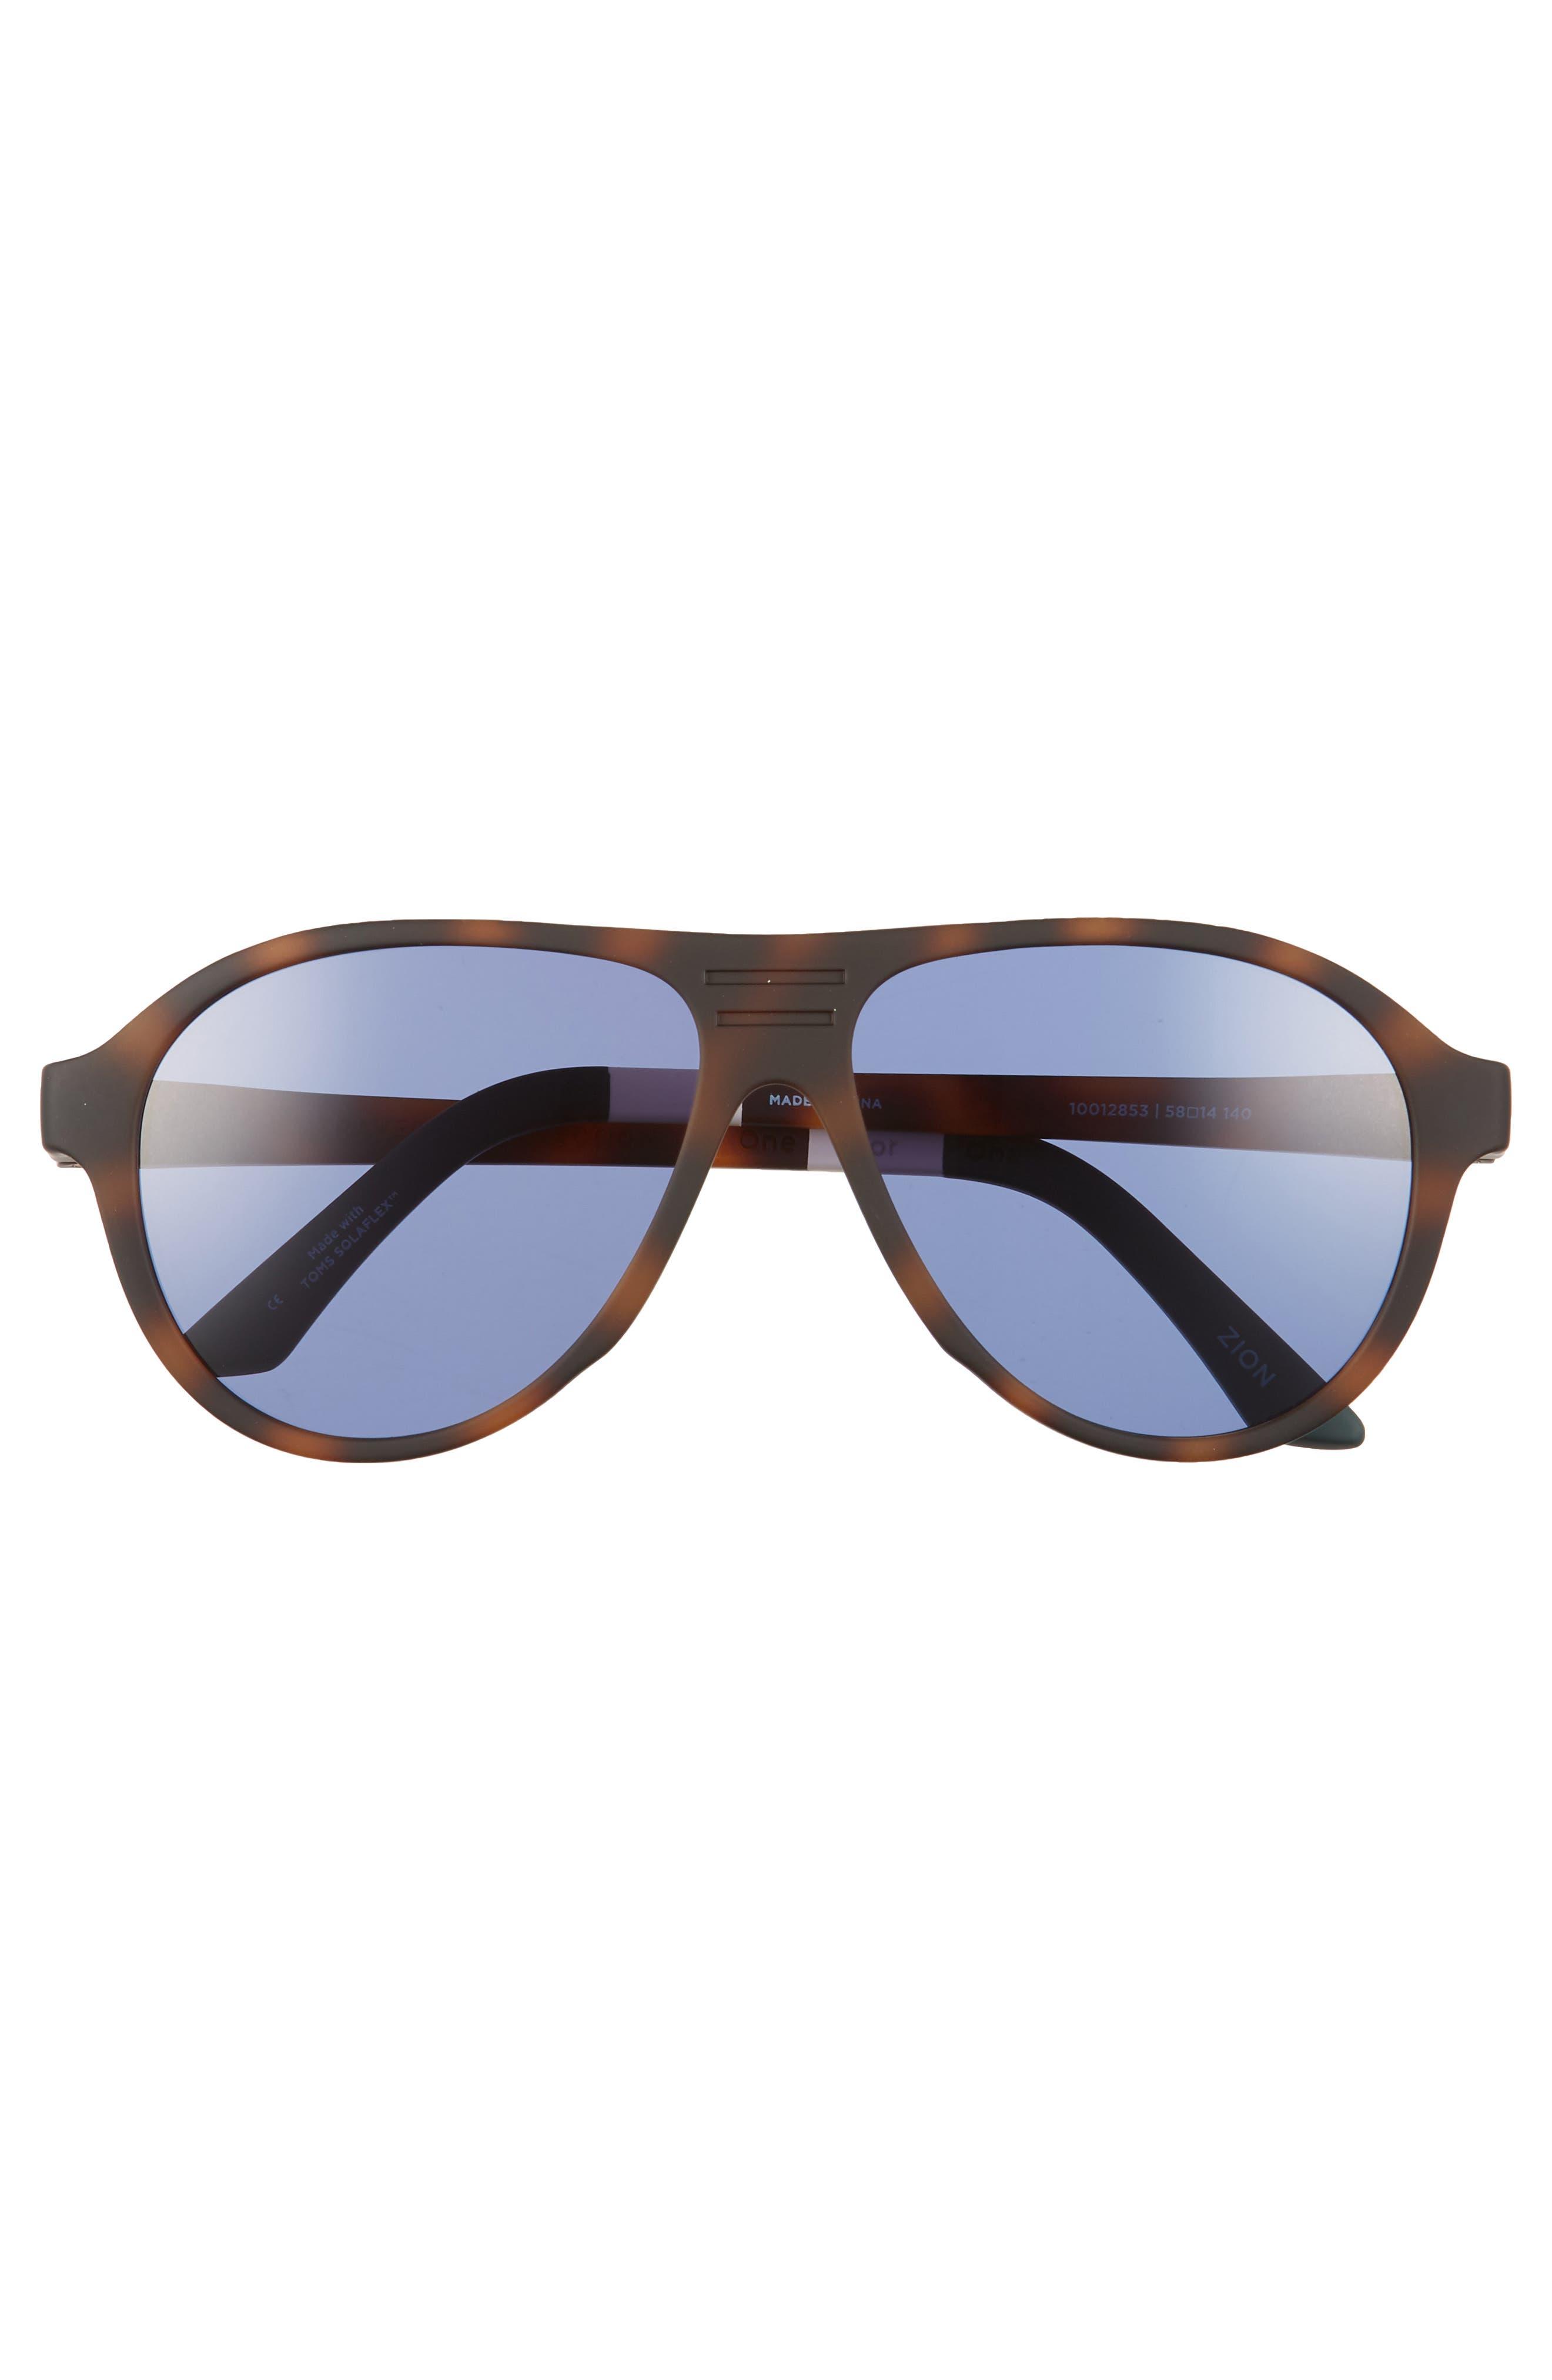 Traveler Zion 58mm Aviator Sunglasses,                             Alternate thumbnail 2, color,                             MATTE DARK TORTOISE/ INDIGO